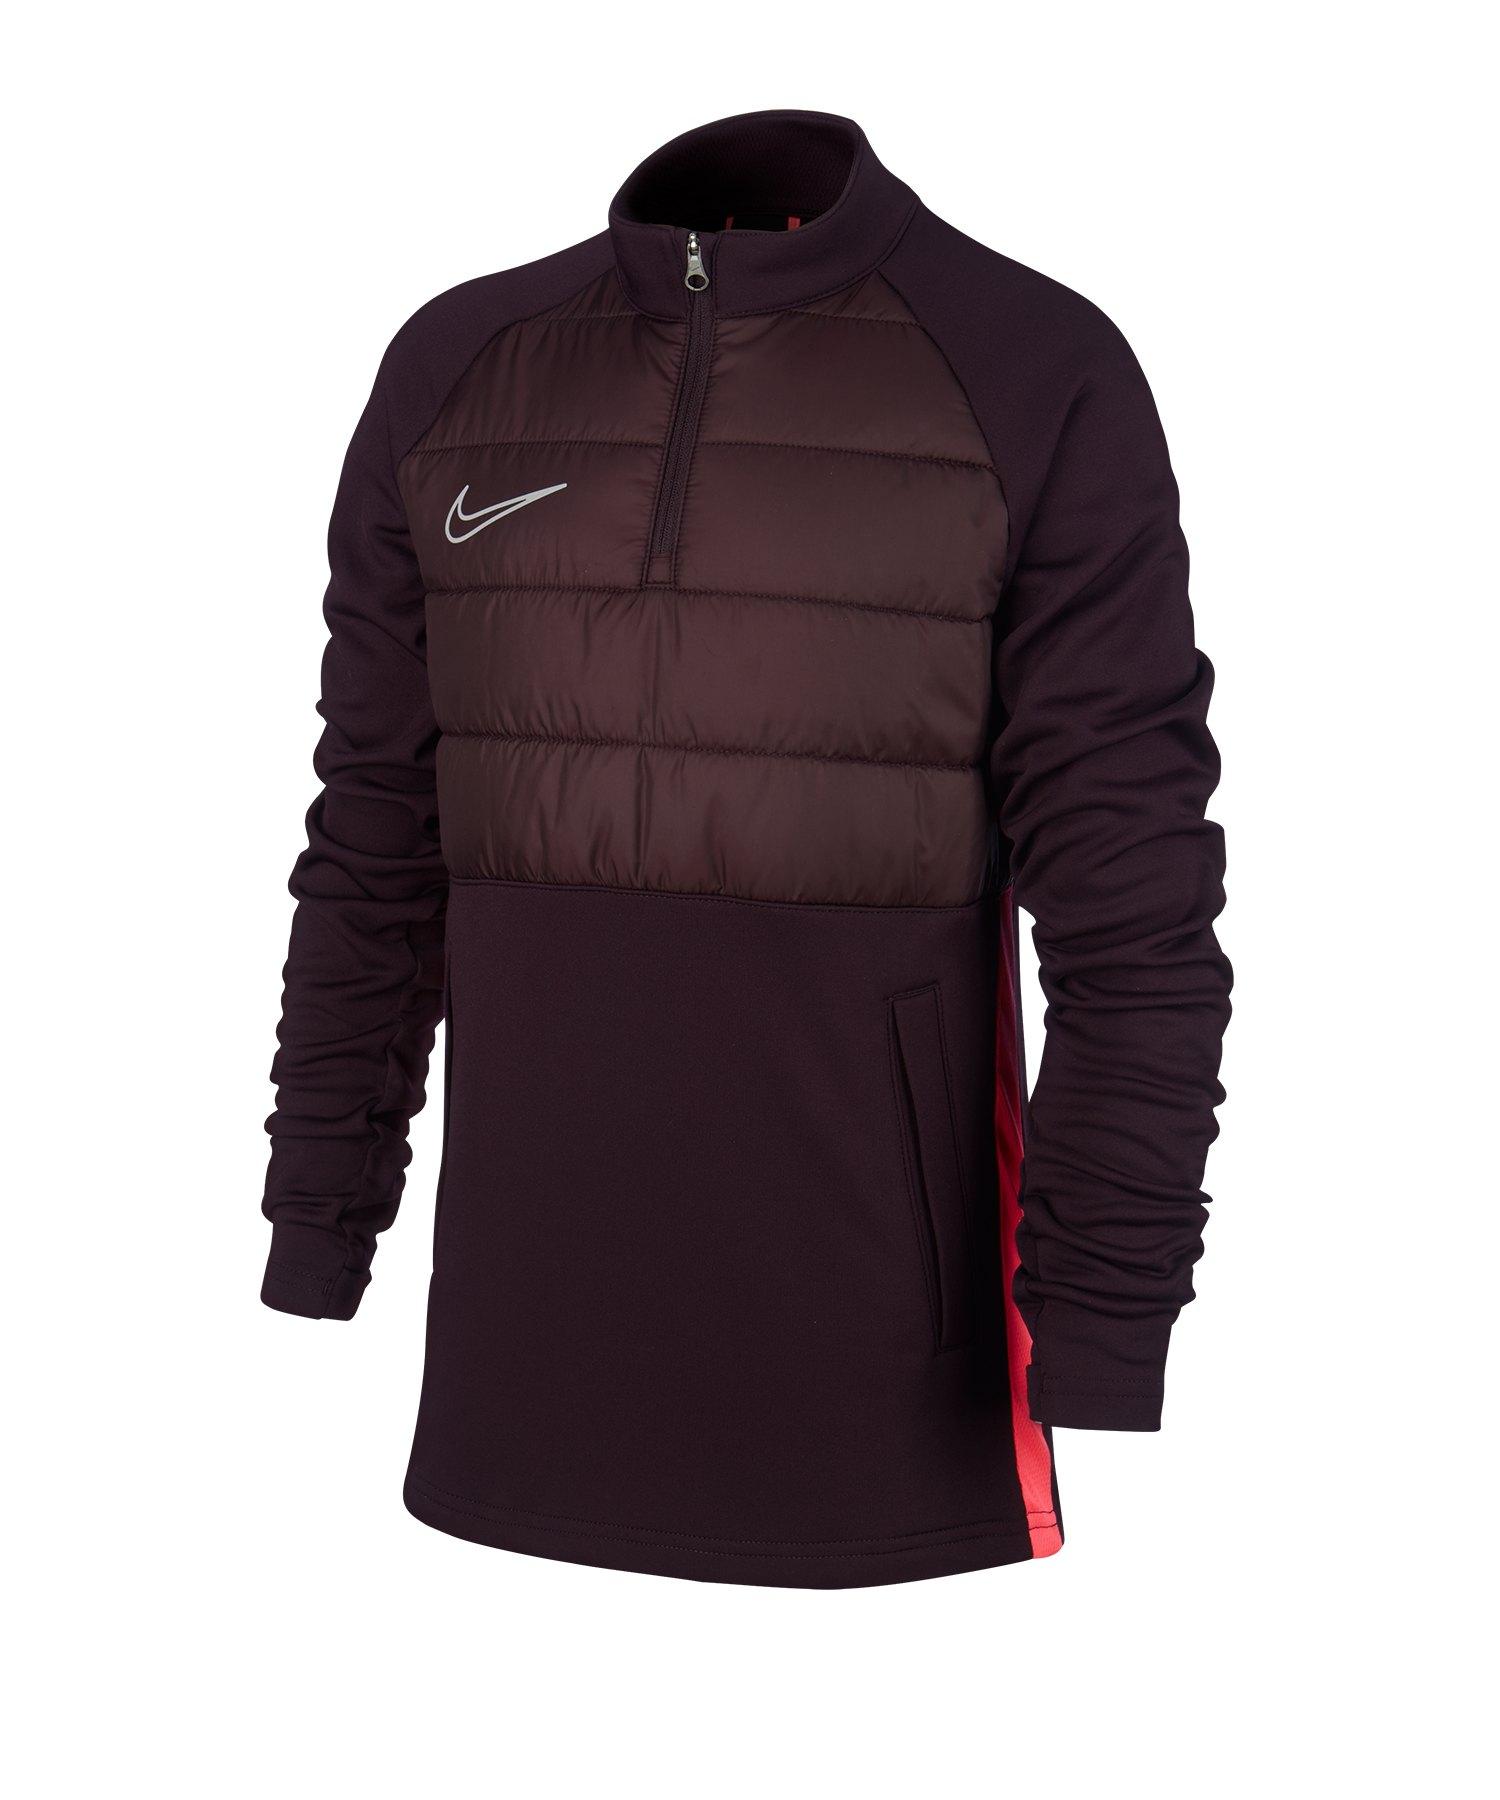 nike quarter zip pullover sale, Nike – Cortez Ultra Rote